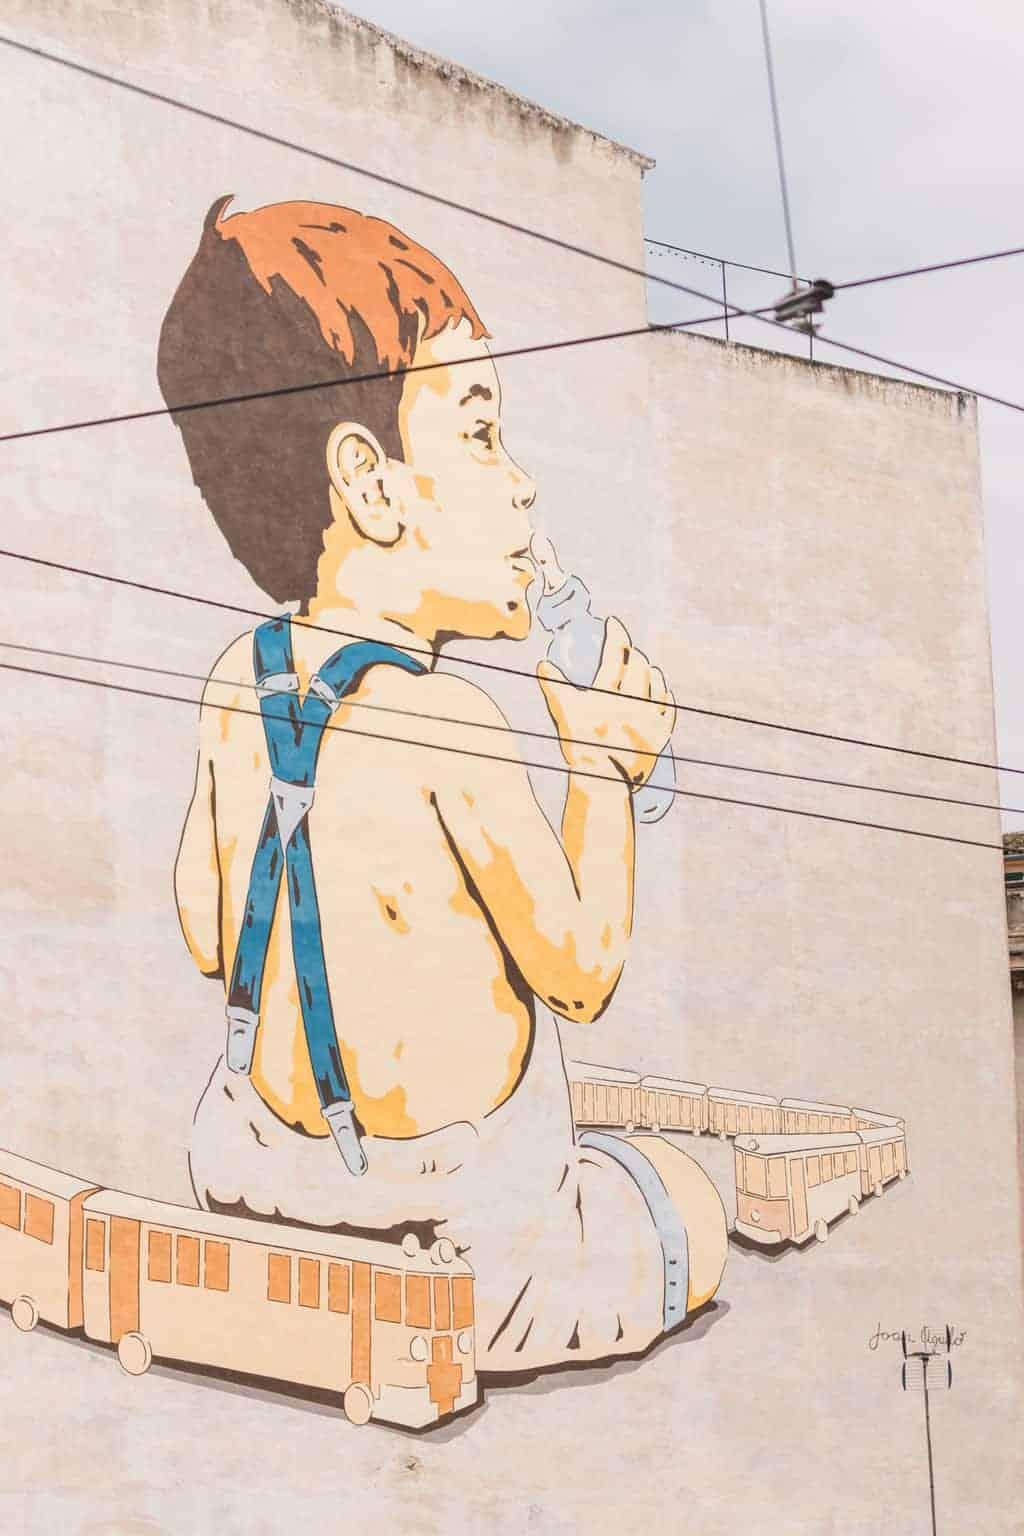 Street art in Palma, Mallorca